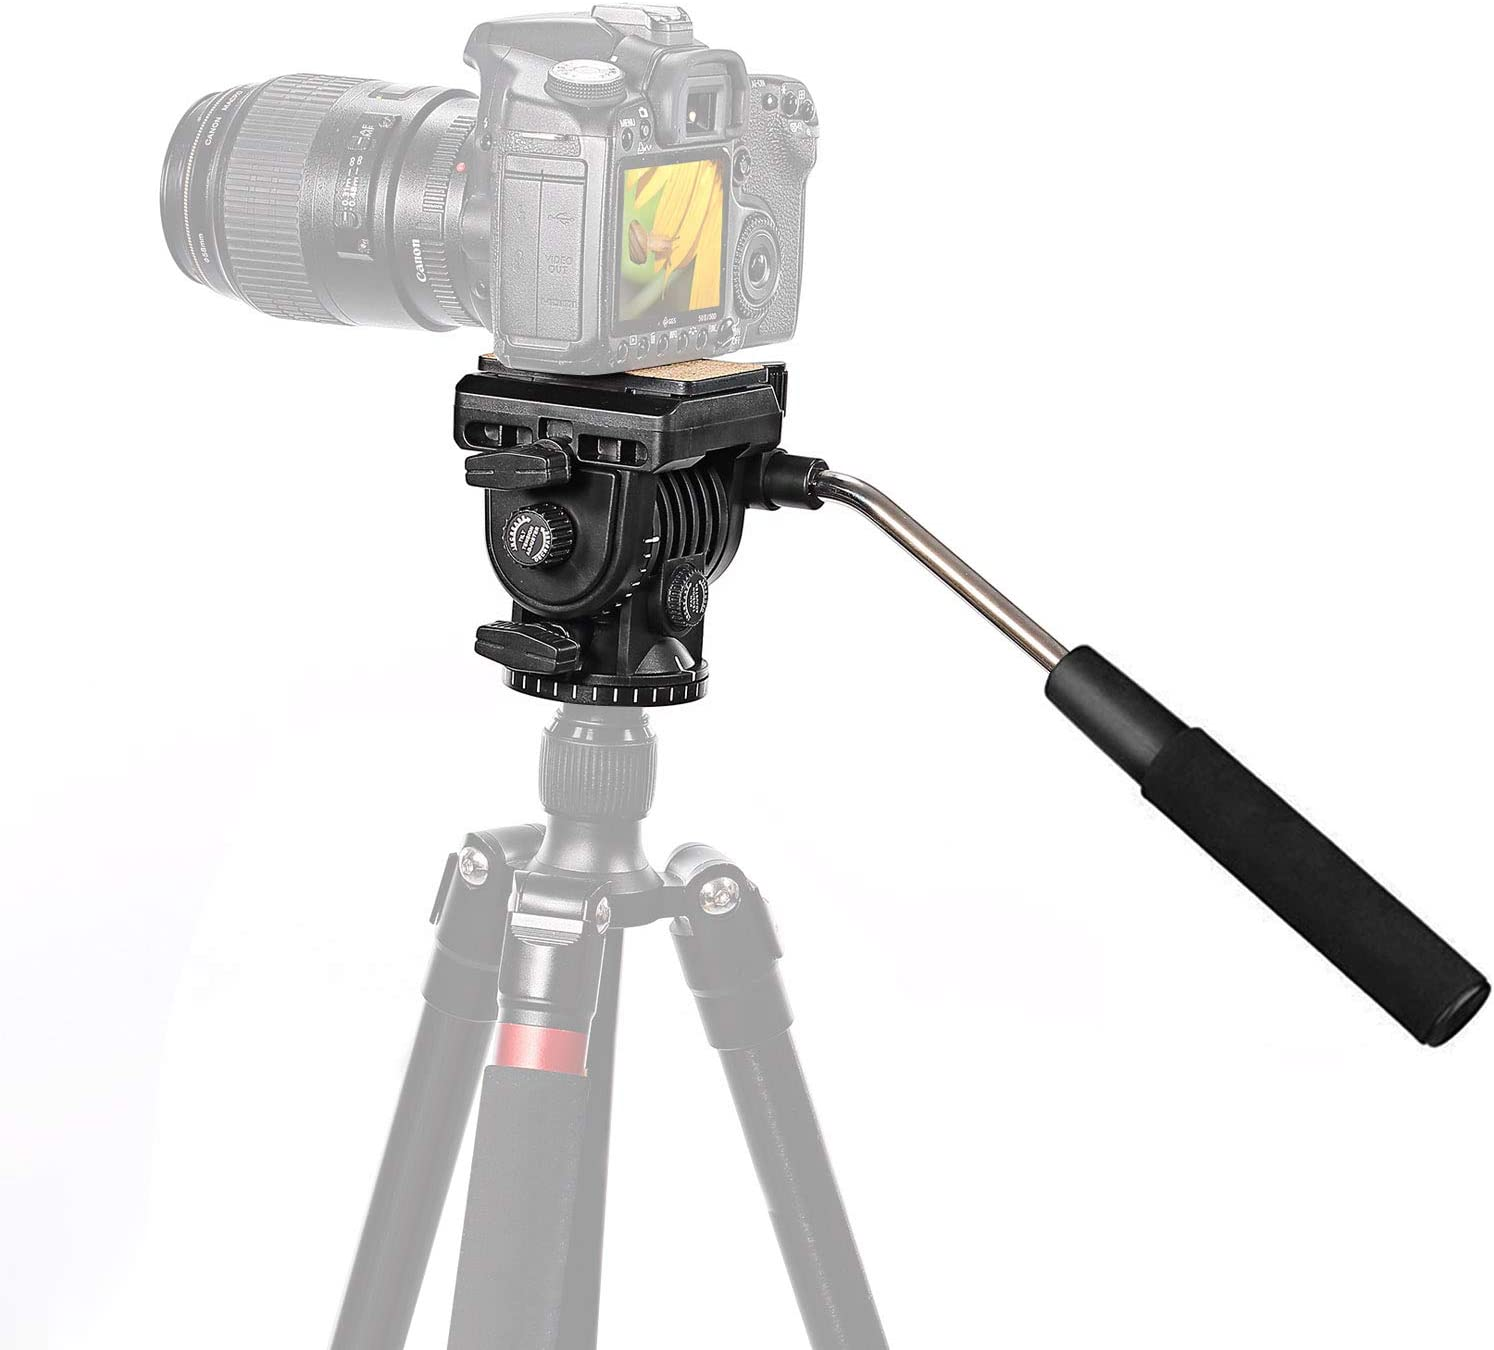 Neewer Fluid Videokopf Videoneiger Stativkopf Kugelkopf Kamera